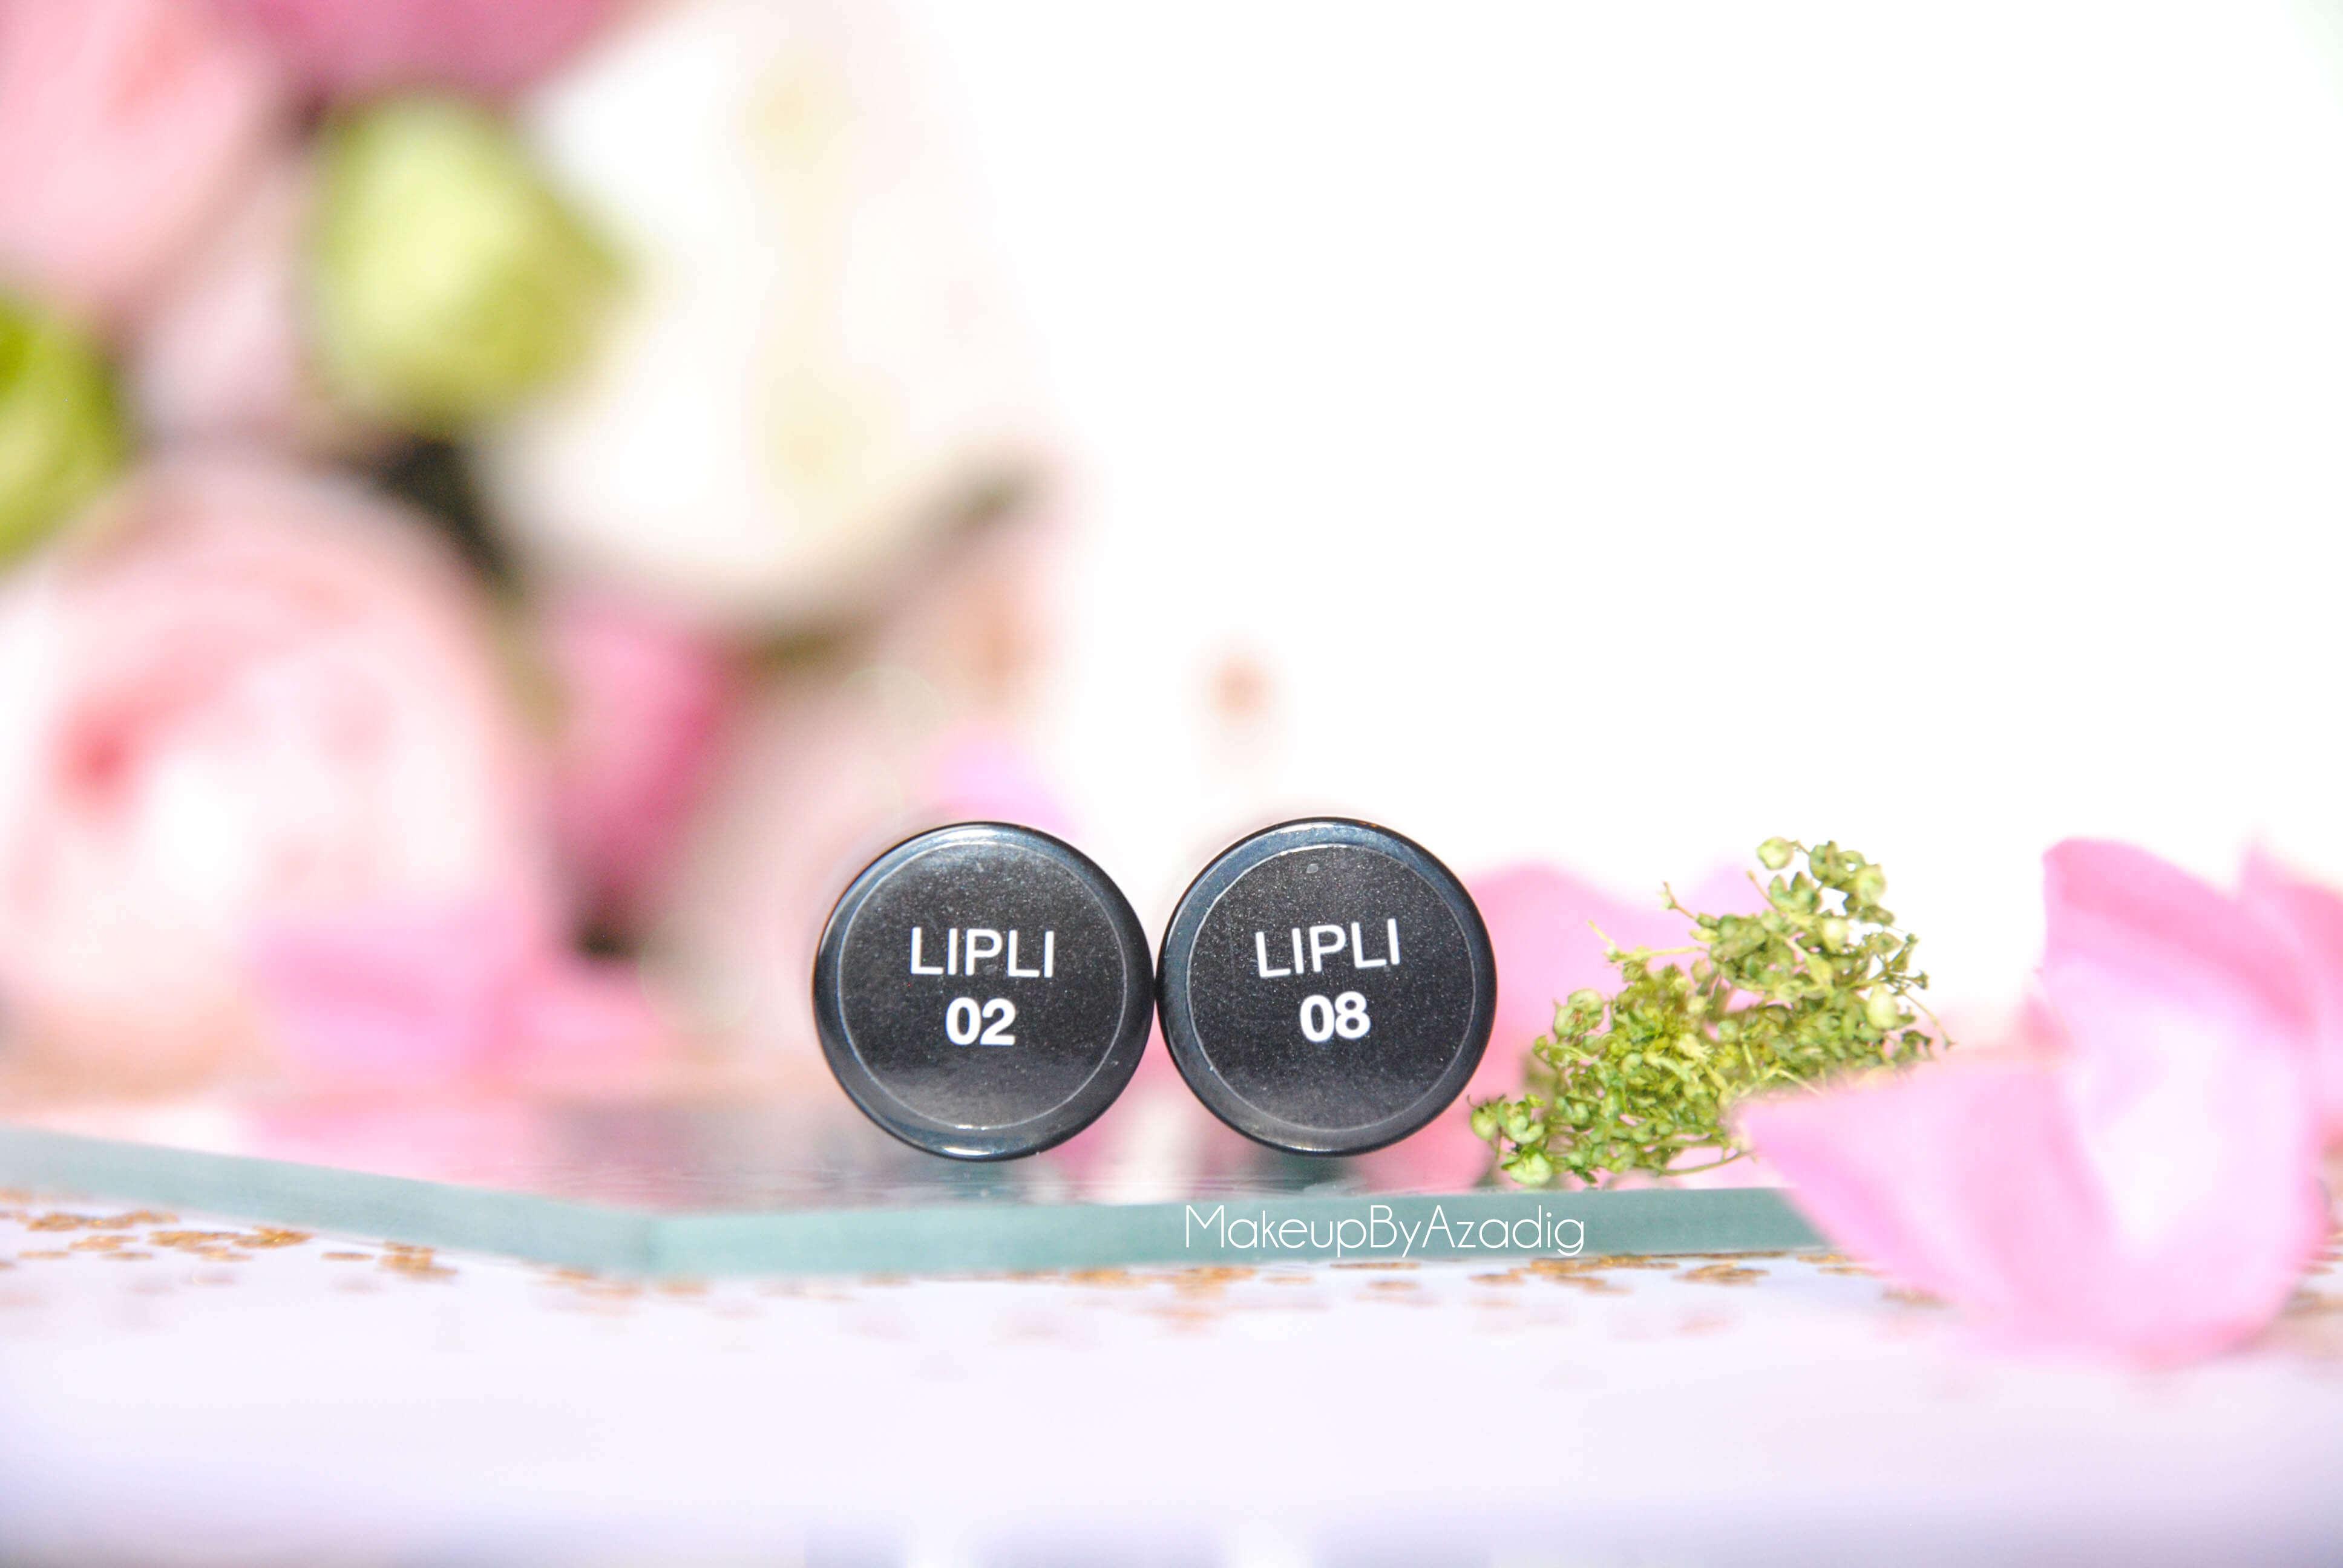 lip lingerie - revue - swatch- nyx cosmetics - embellishment - bedtime flirt - makeupbyazadig - enjoyphoenix - troyes - dos